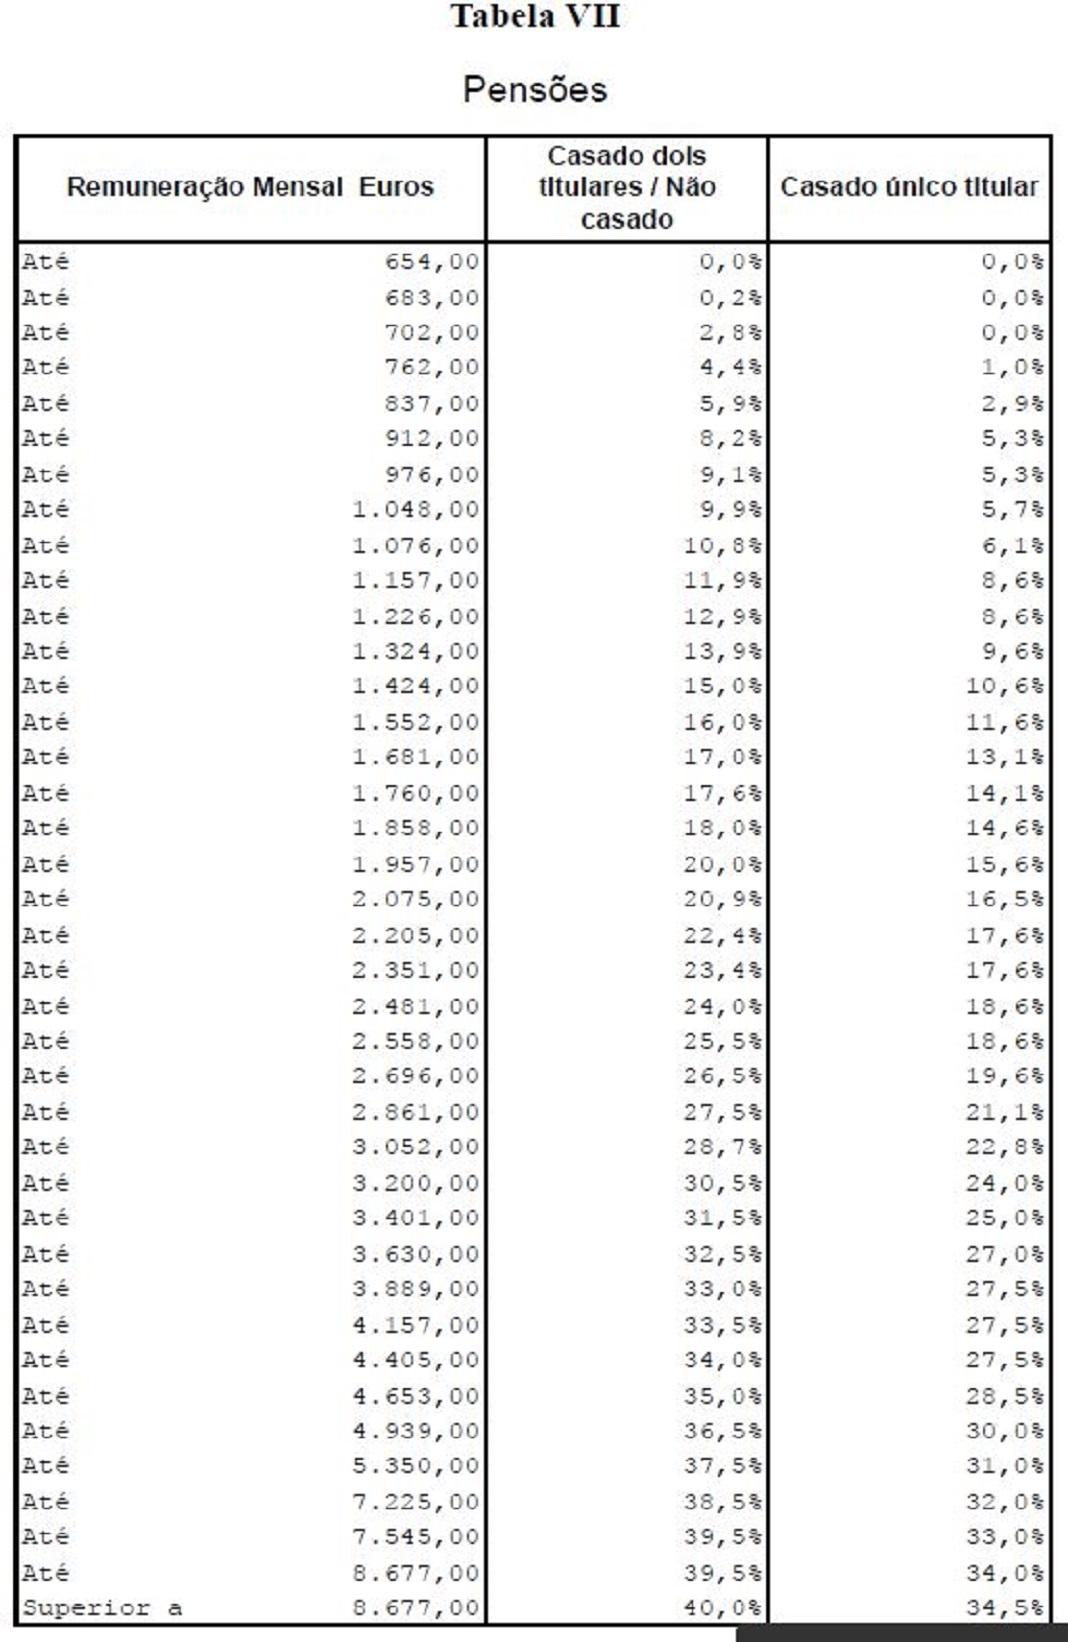 Tabela VII - IRS